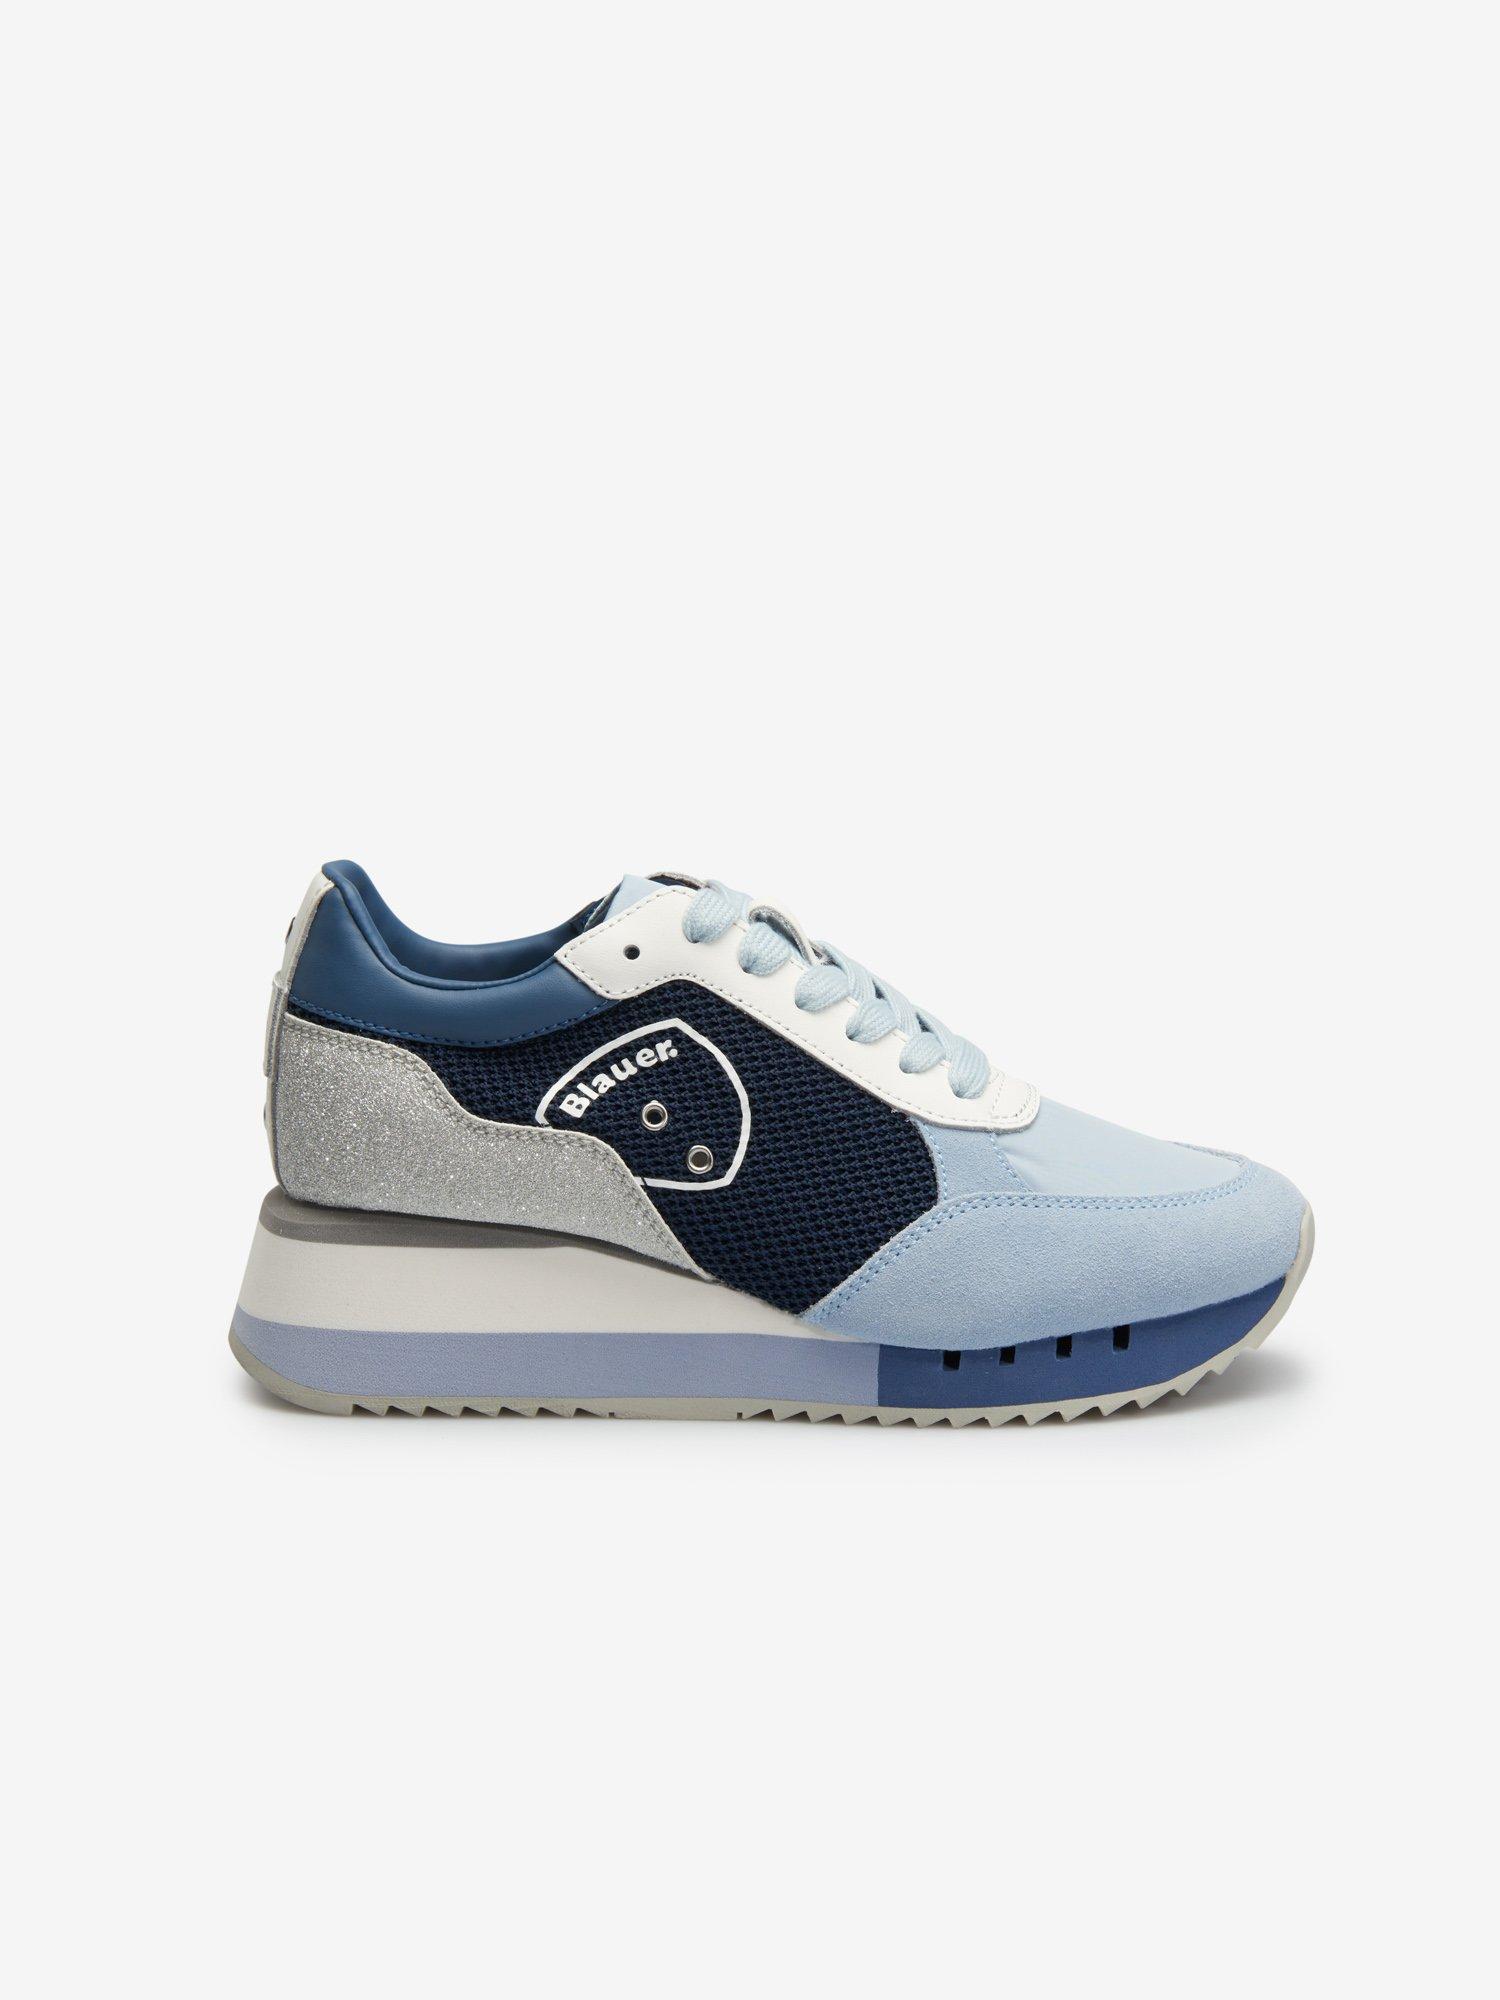 Charlotte Glitter  Sneakers - Blauer